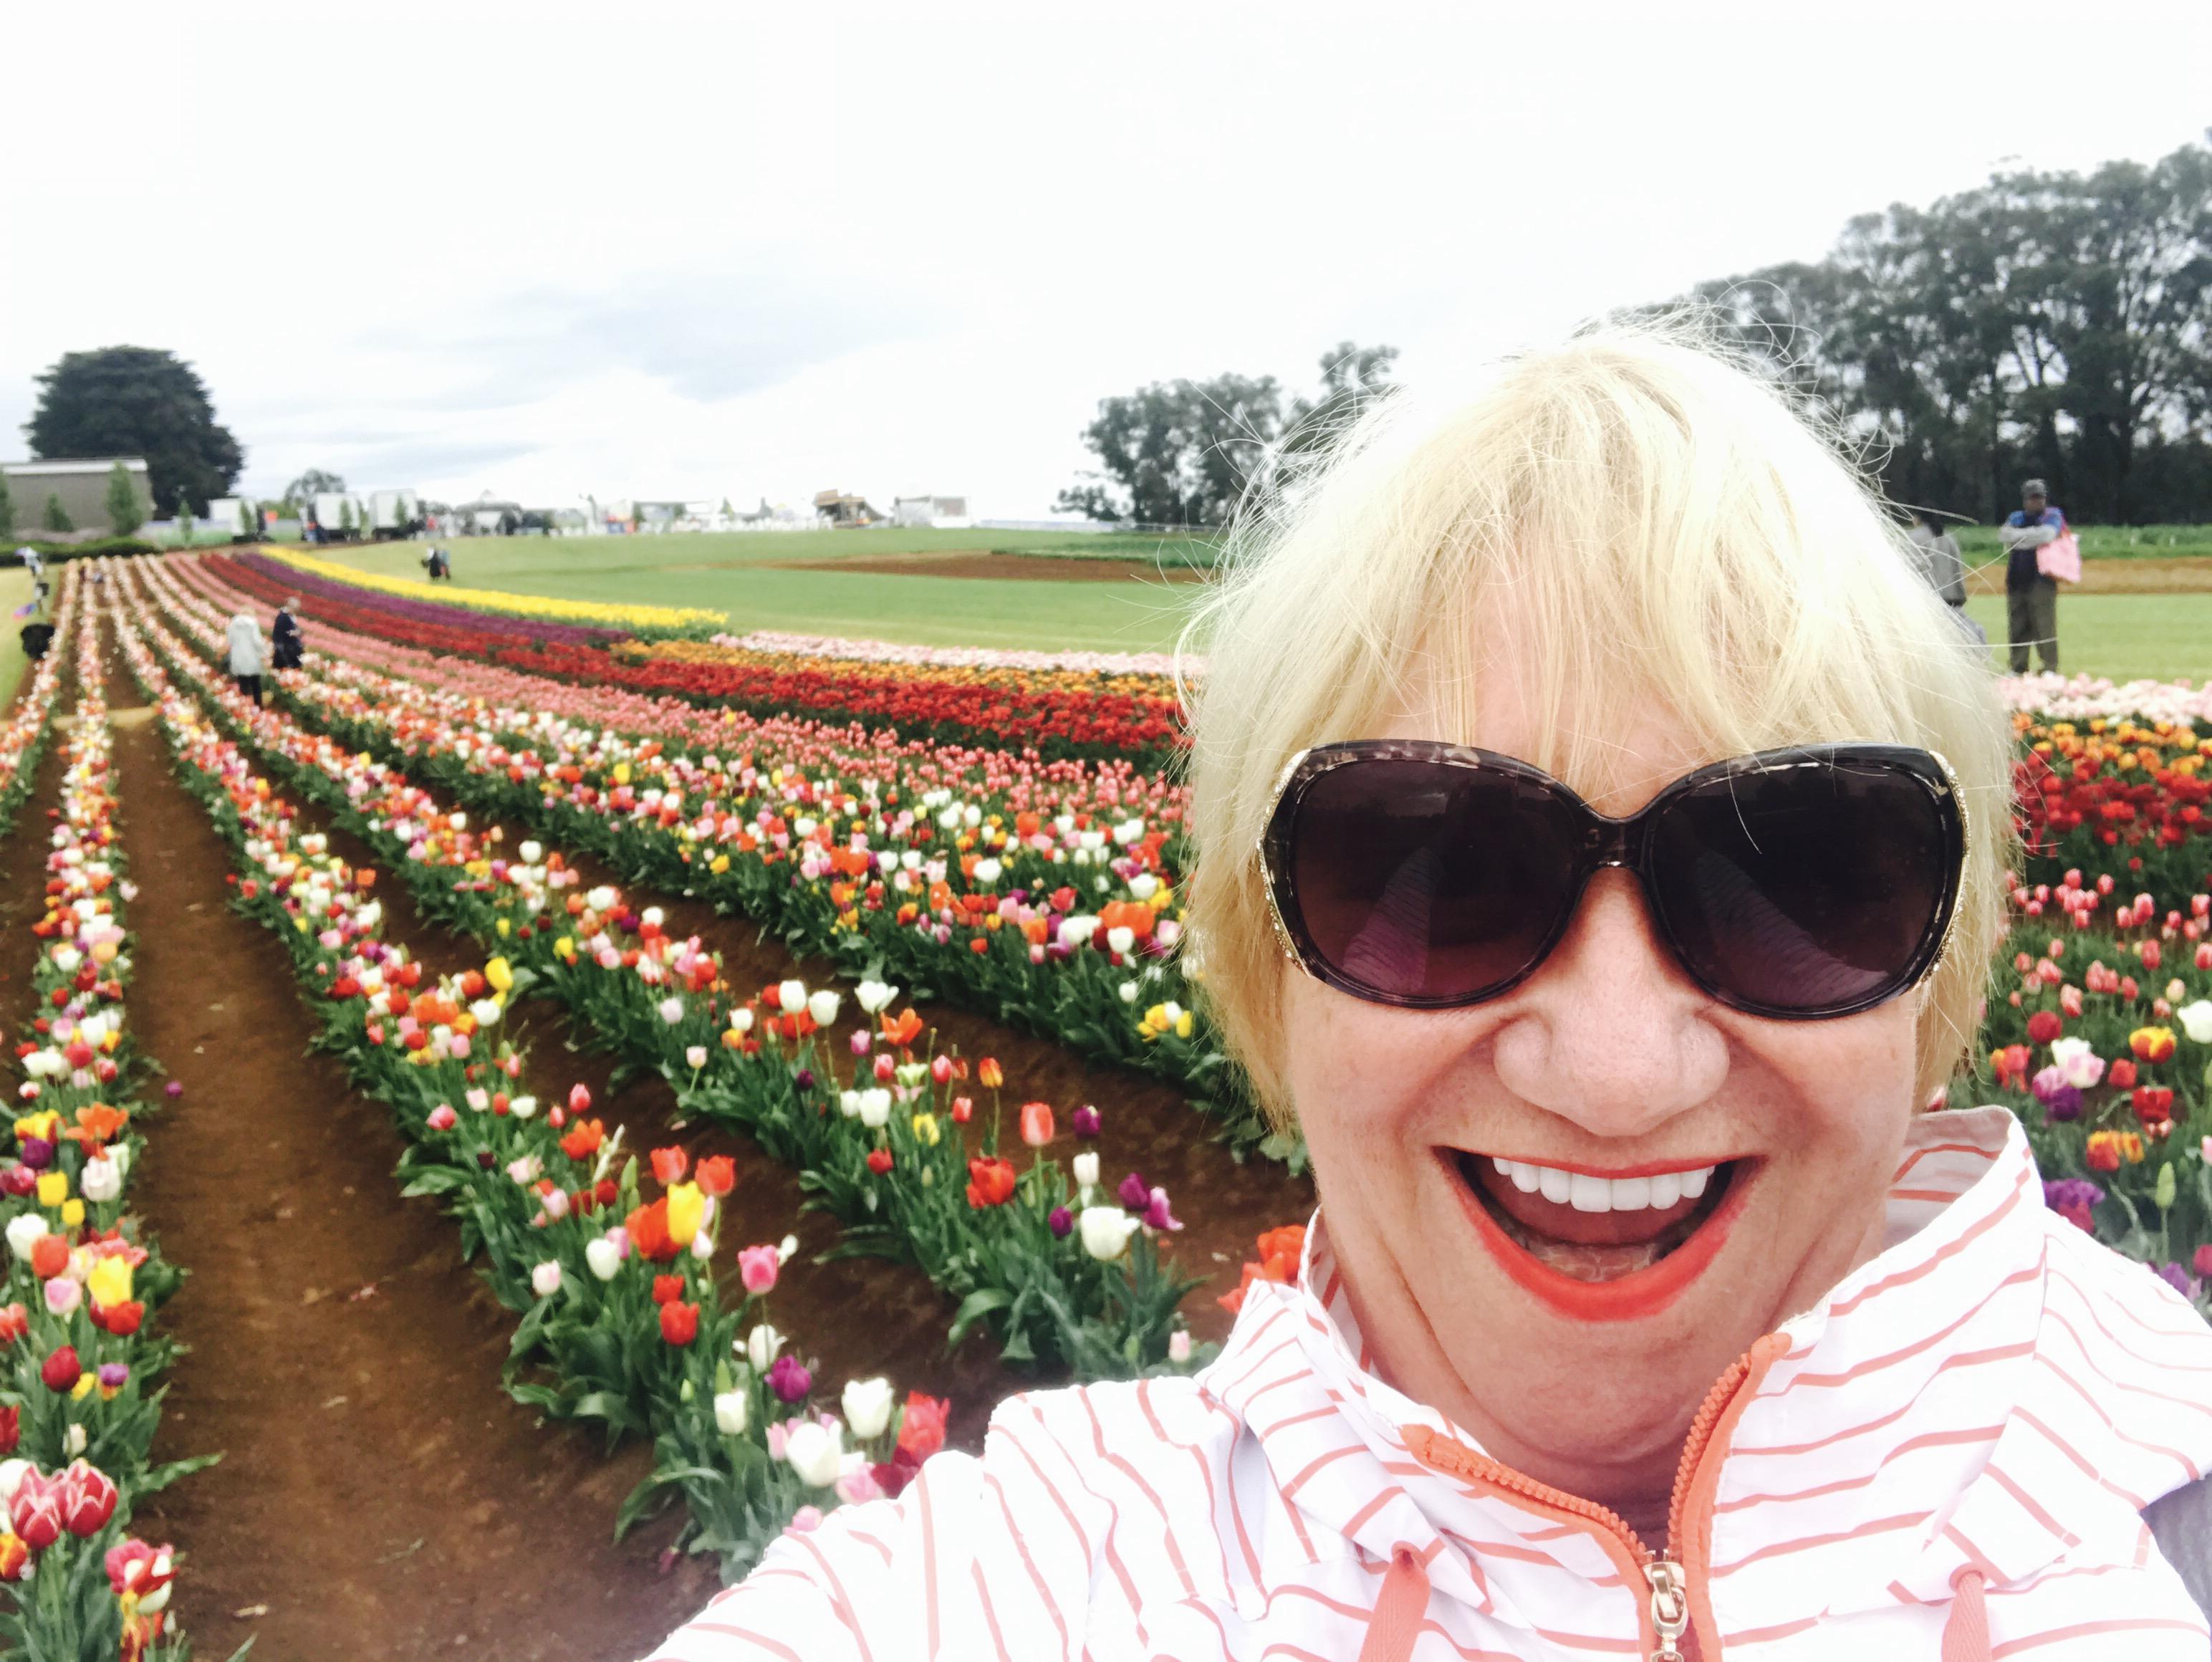 Writer Ann Rickard re-visited some fond memories at the Tesselaar Tulip Farm.